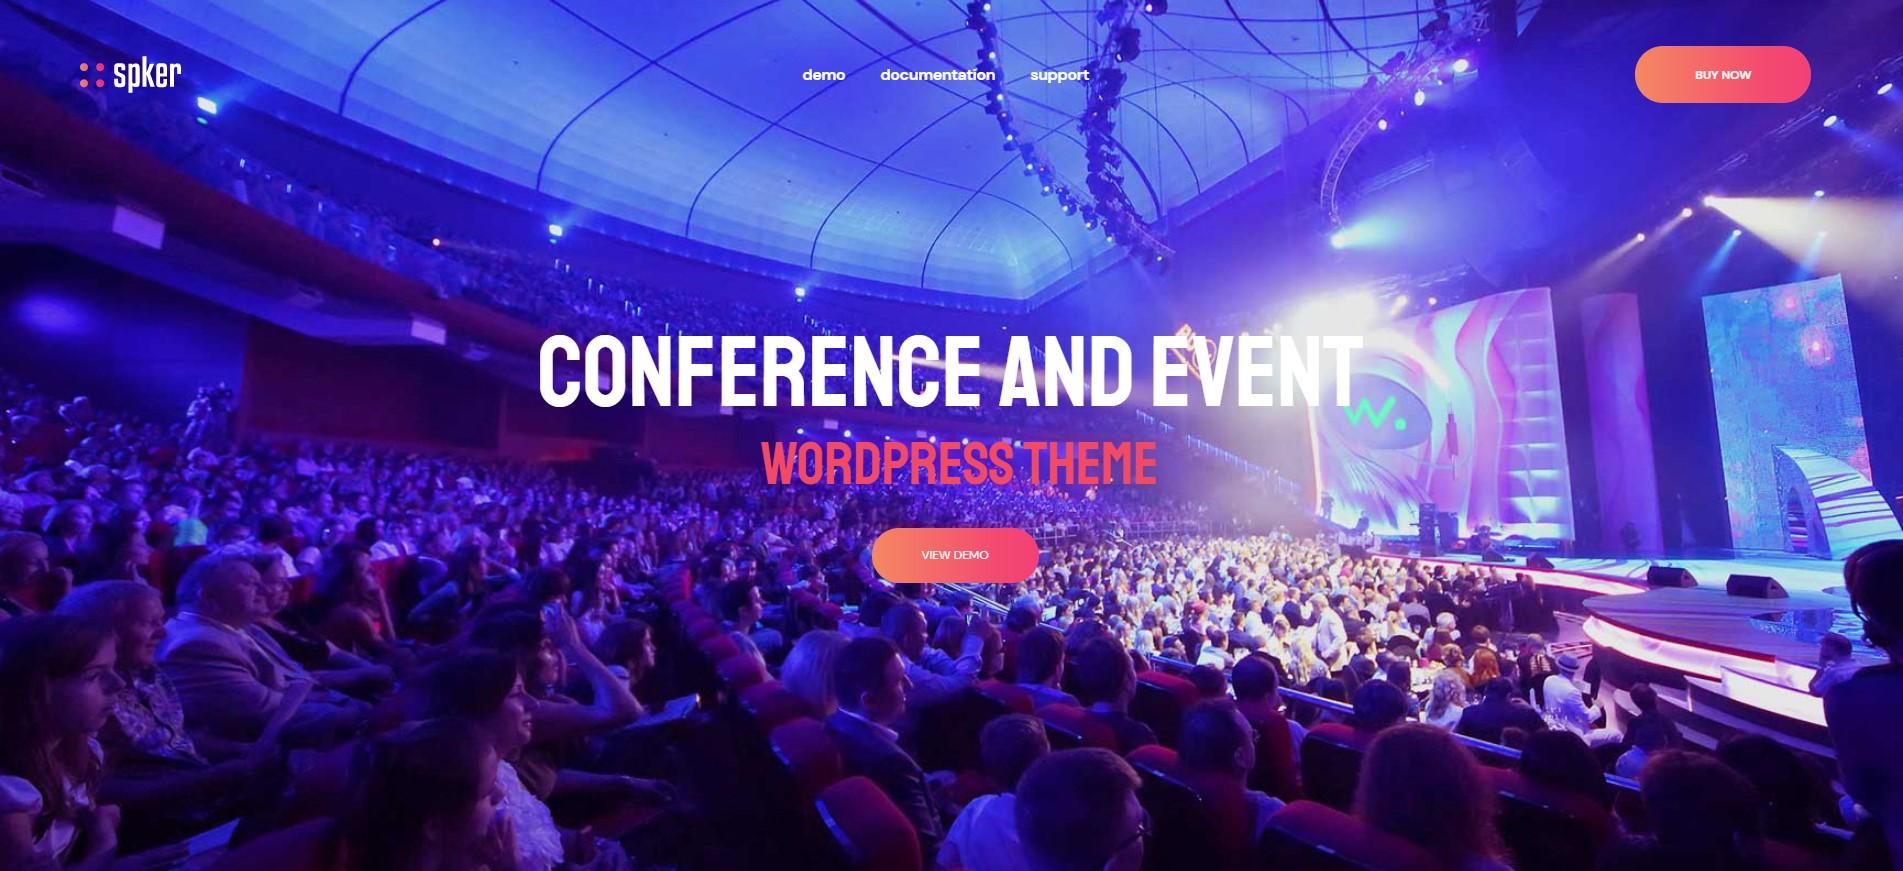 spker conference event wordpress theme